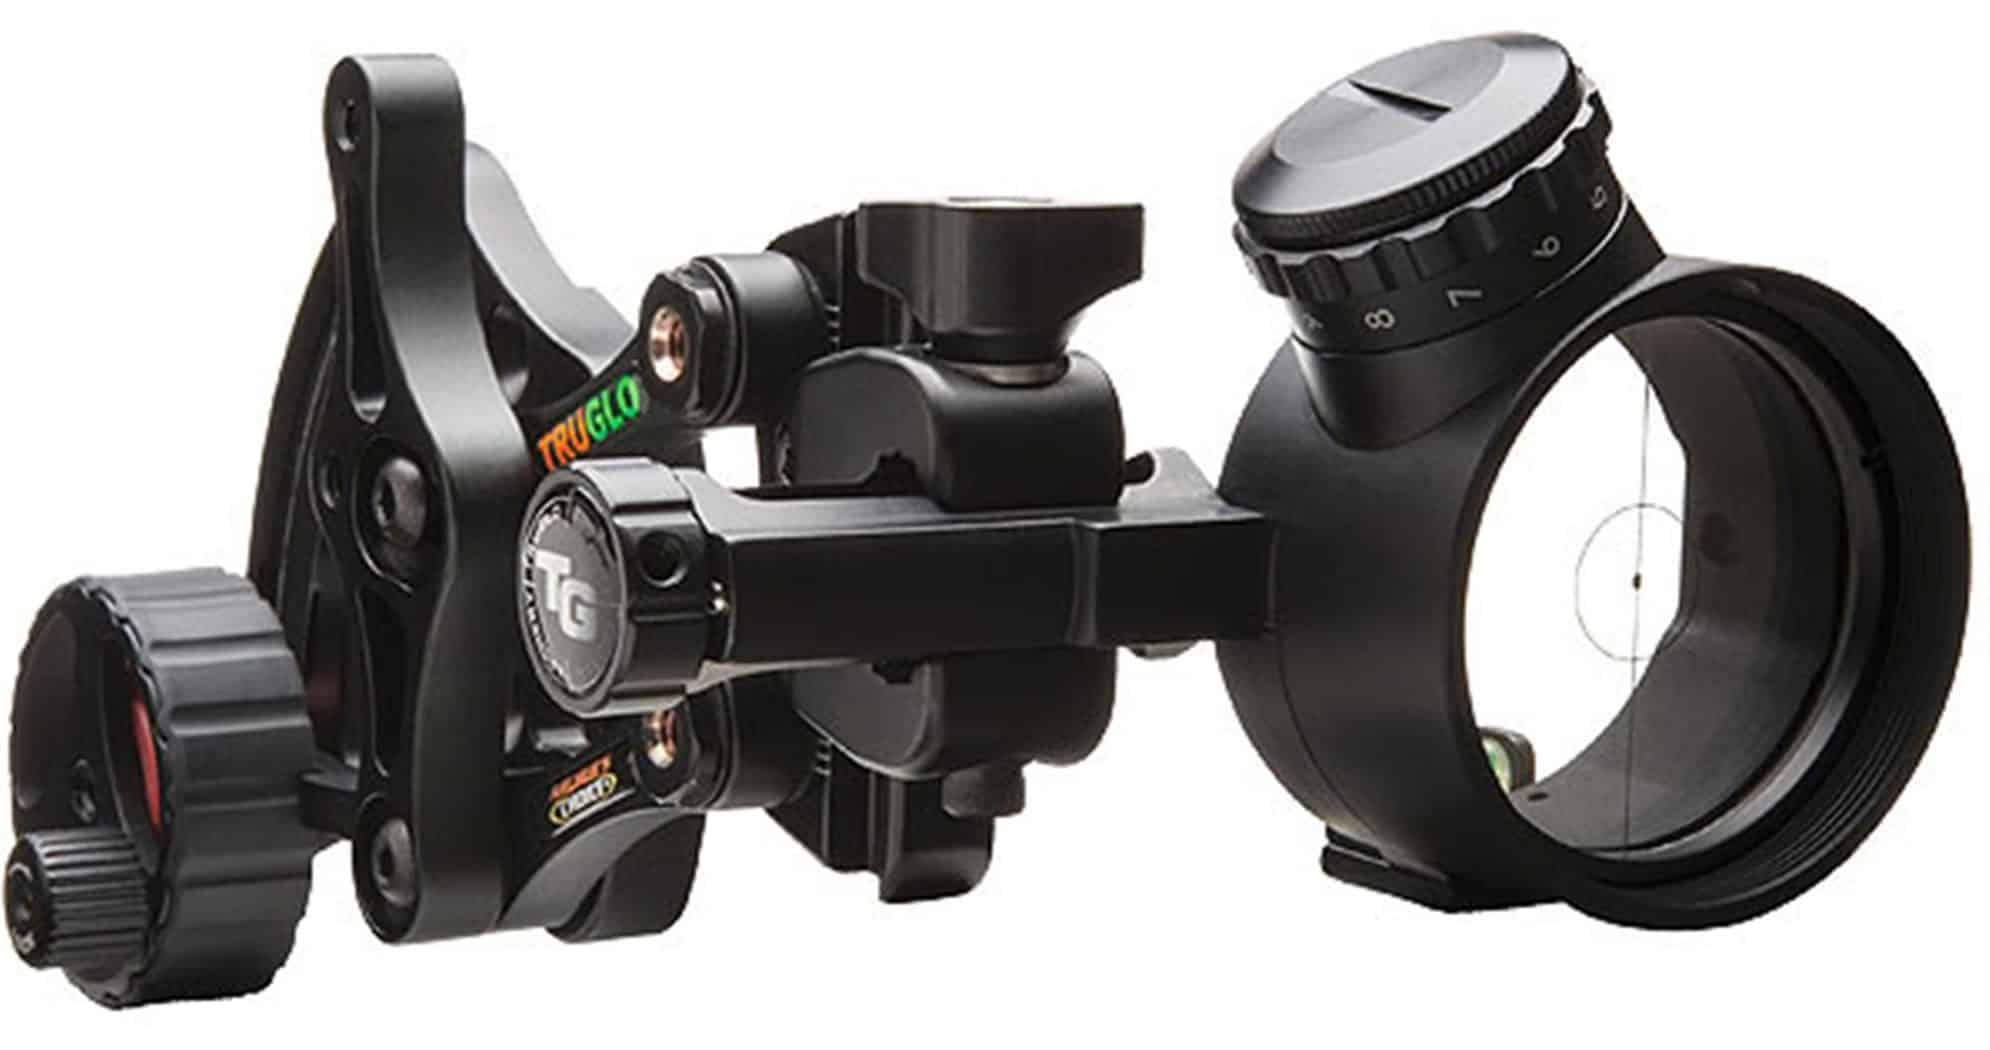 TRUGLO Range Rover Pro Archer's Choice LED 1-Pin Sight Black